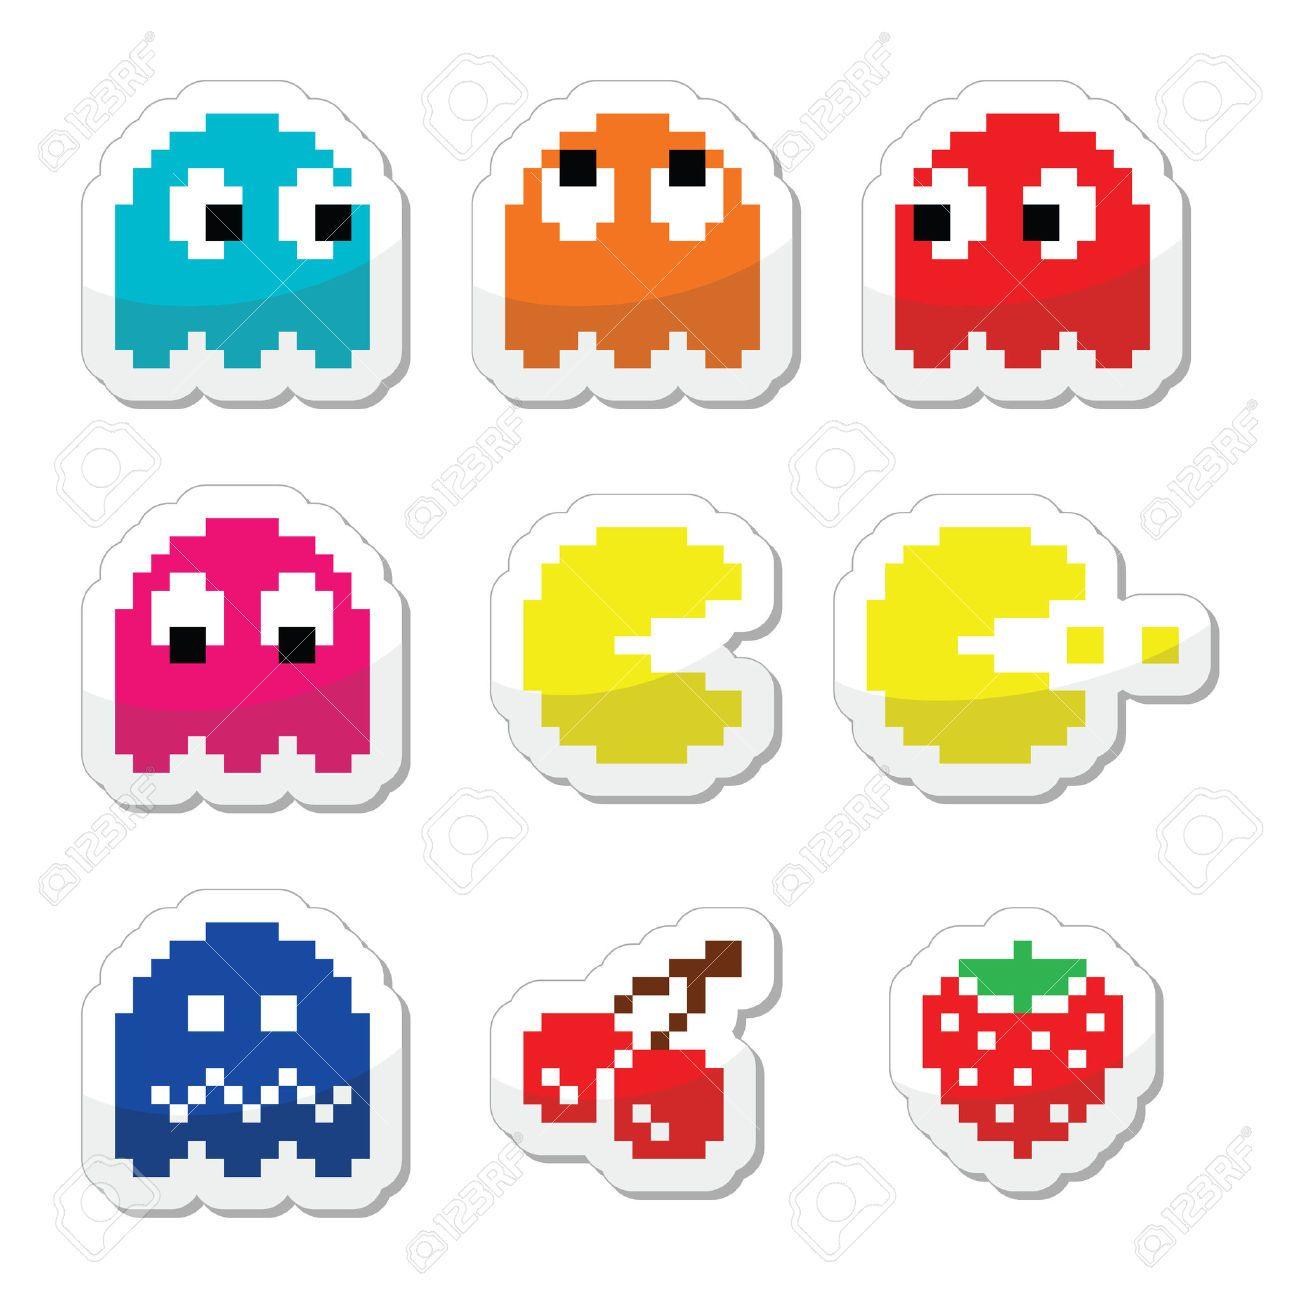 pac man cherries Google Search Pacman, Gaming computer